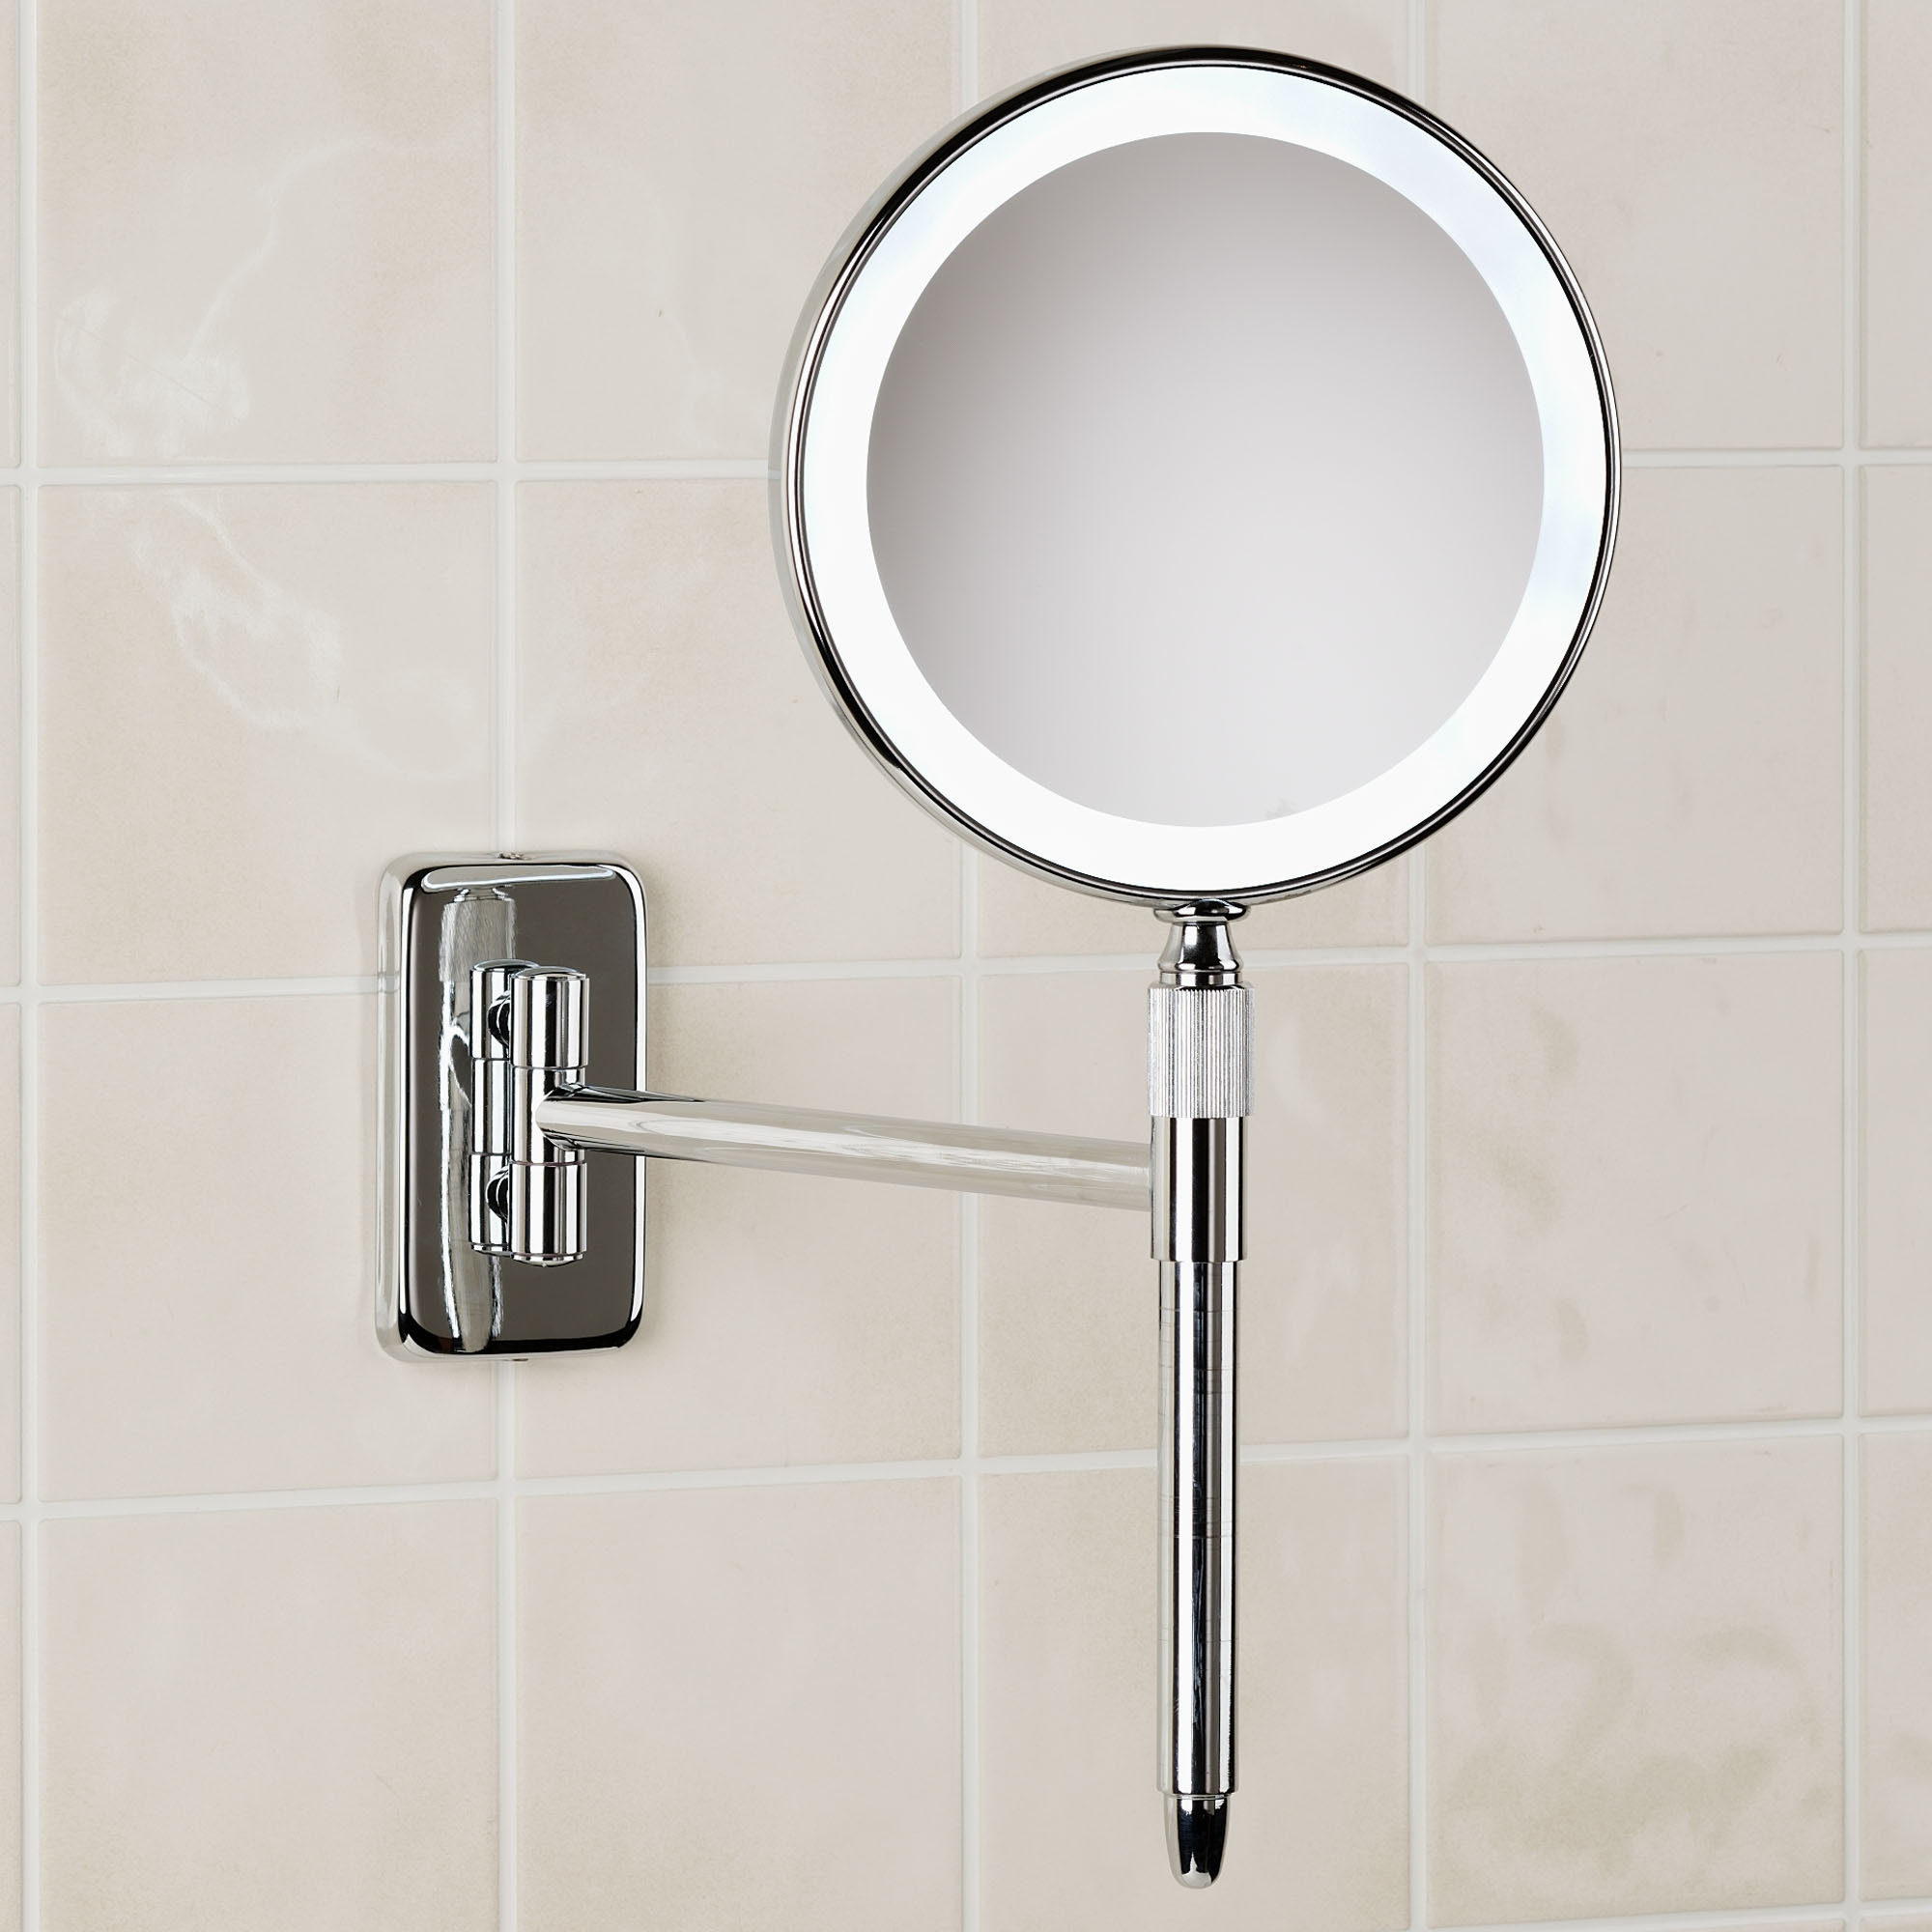 Bathroom Makeup Mirror Wall Mount